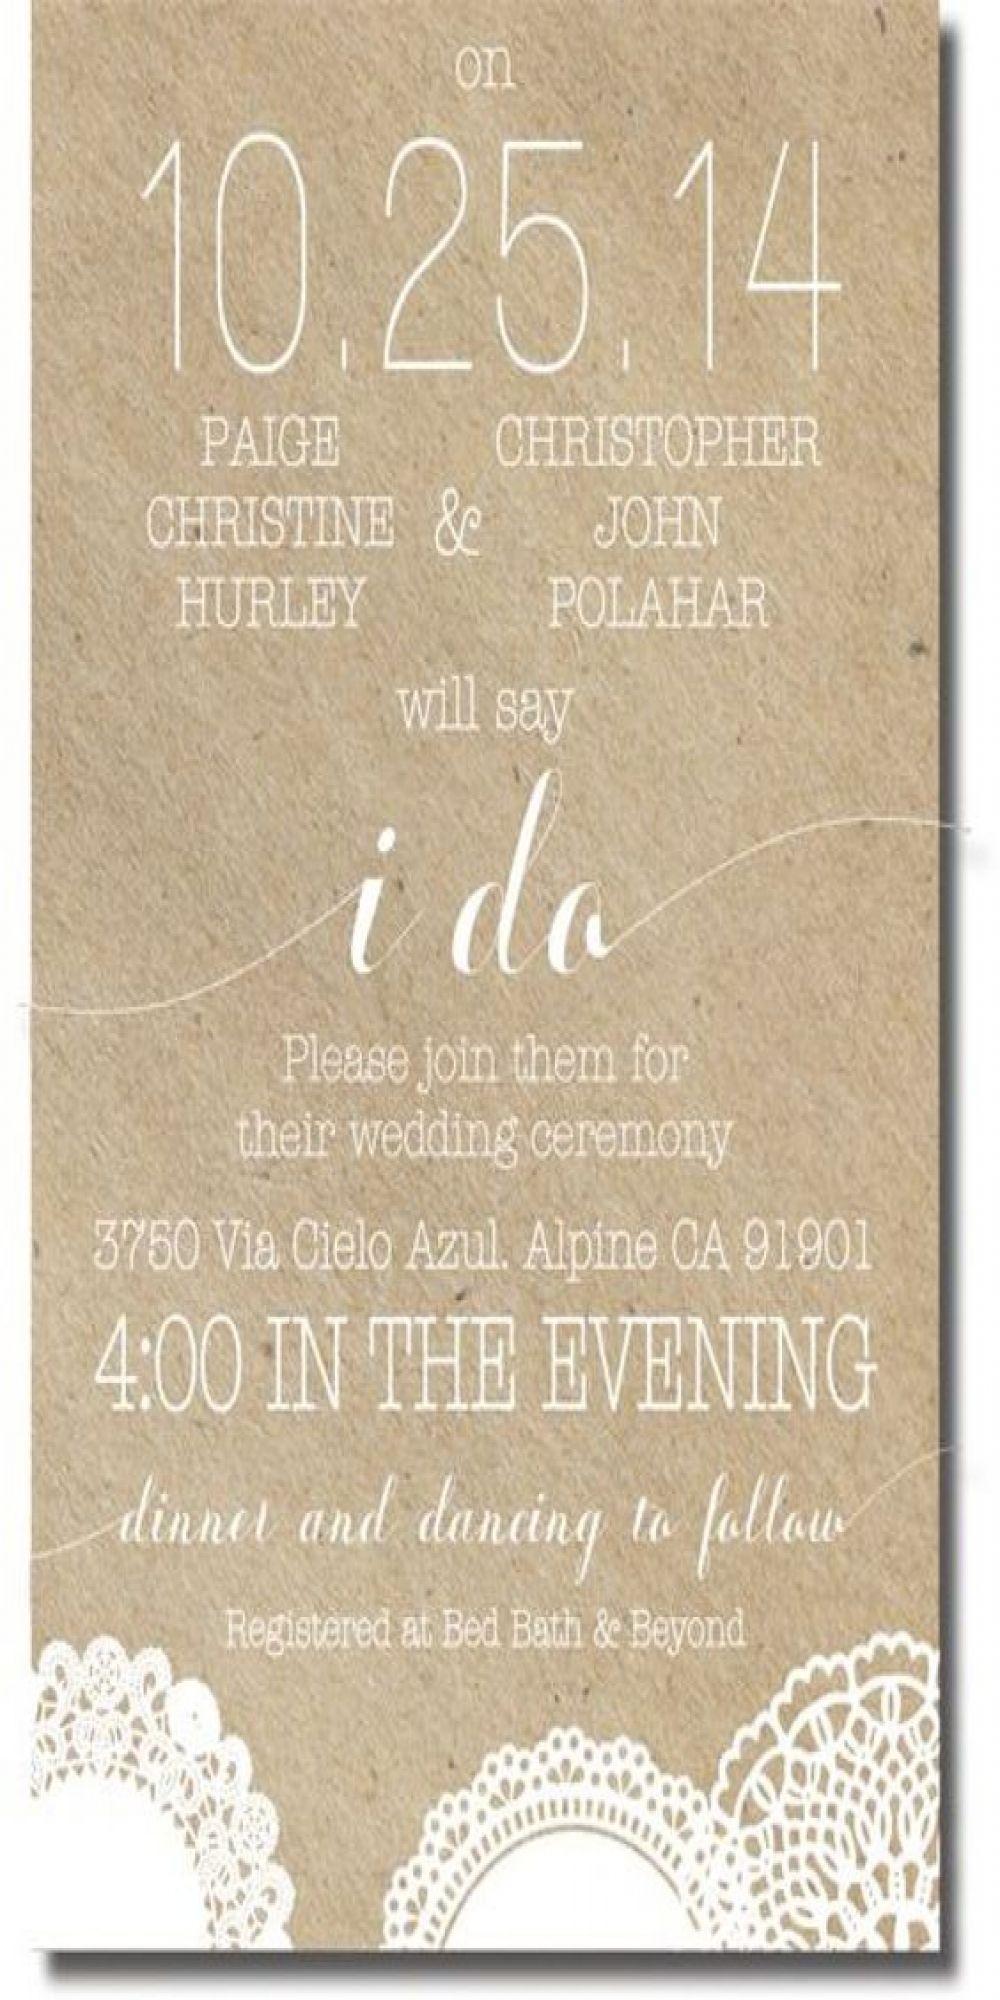 Cheap Wedding Stationery Cheapweddingstationery Cheapmarriagestationery Discou Cheap Wedding Invitations Wedding Invitation Samples Wedding Invitations